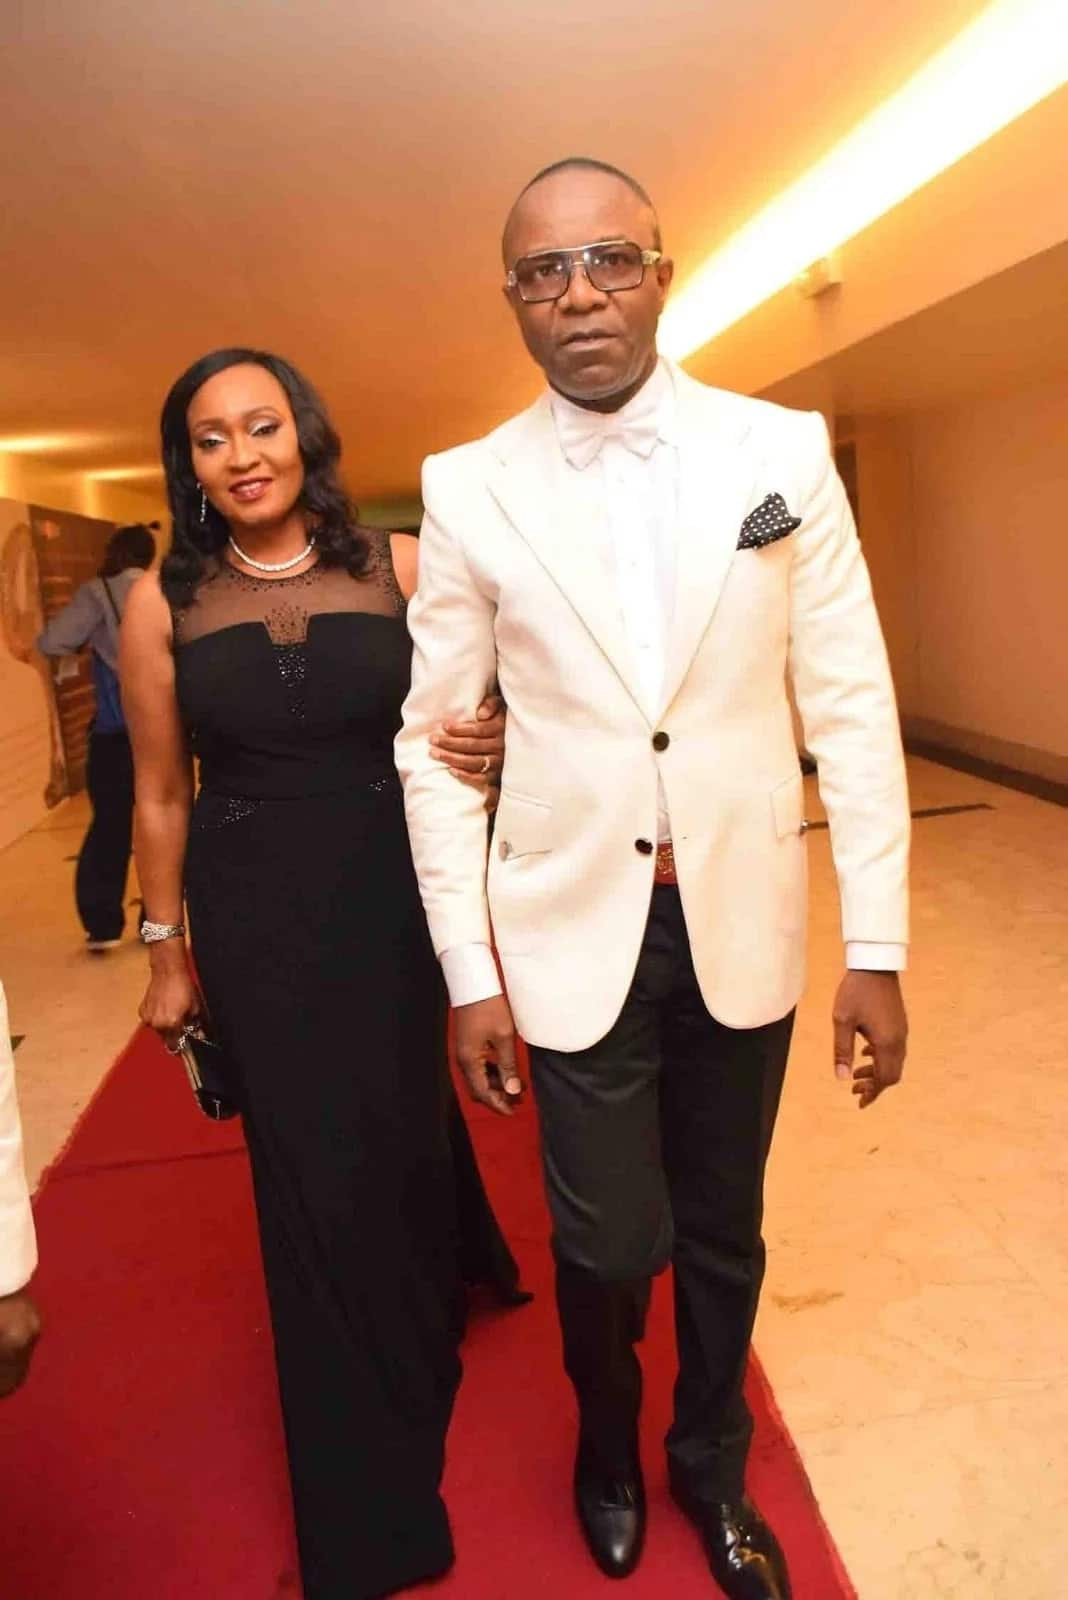 Ibe Kachikwu's second wife